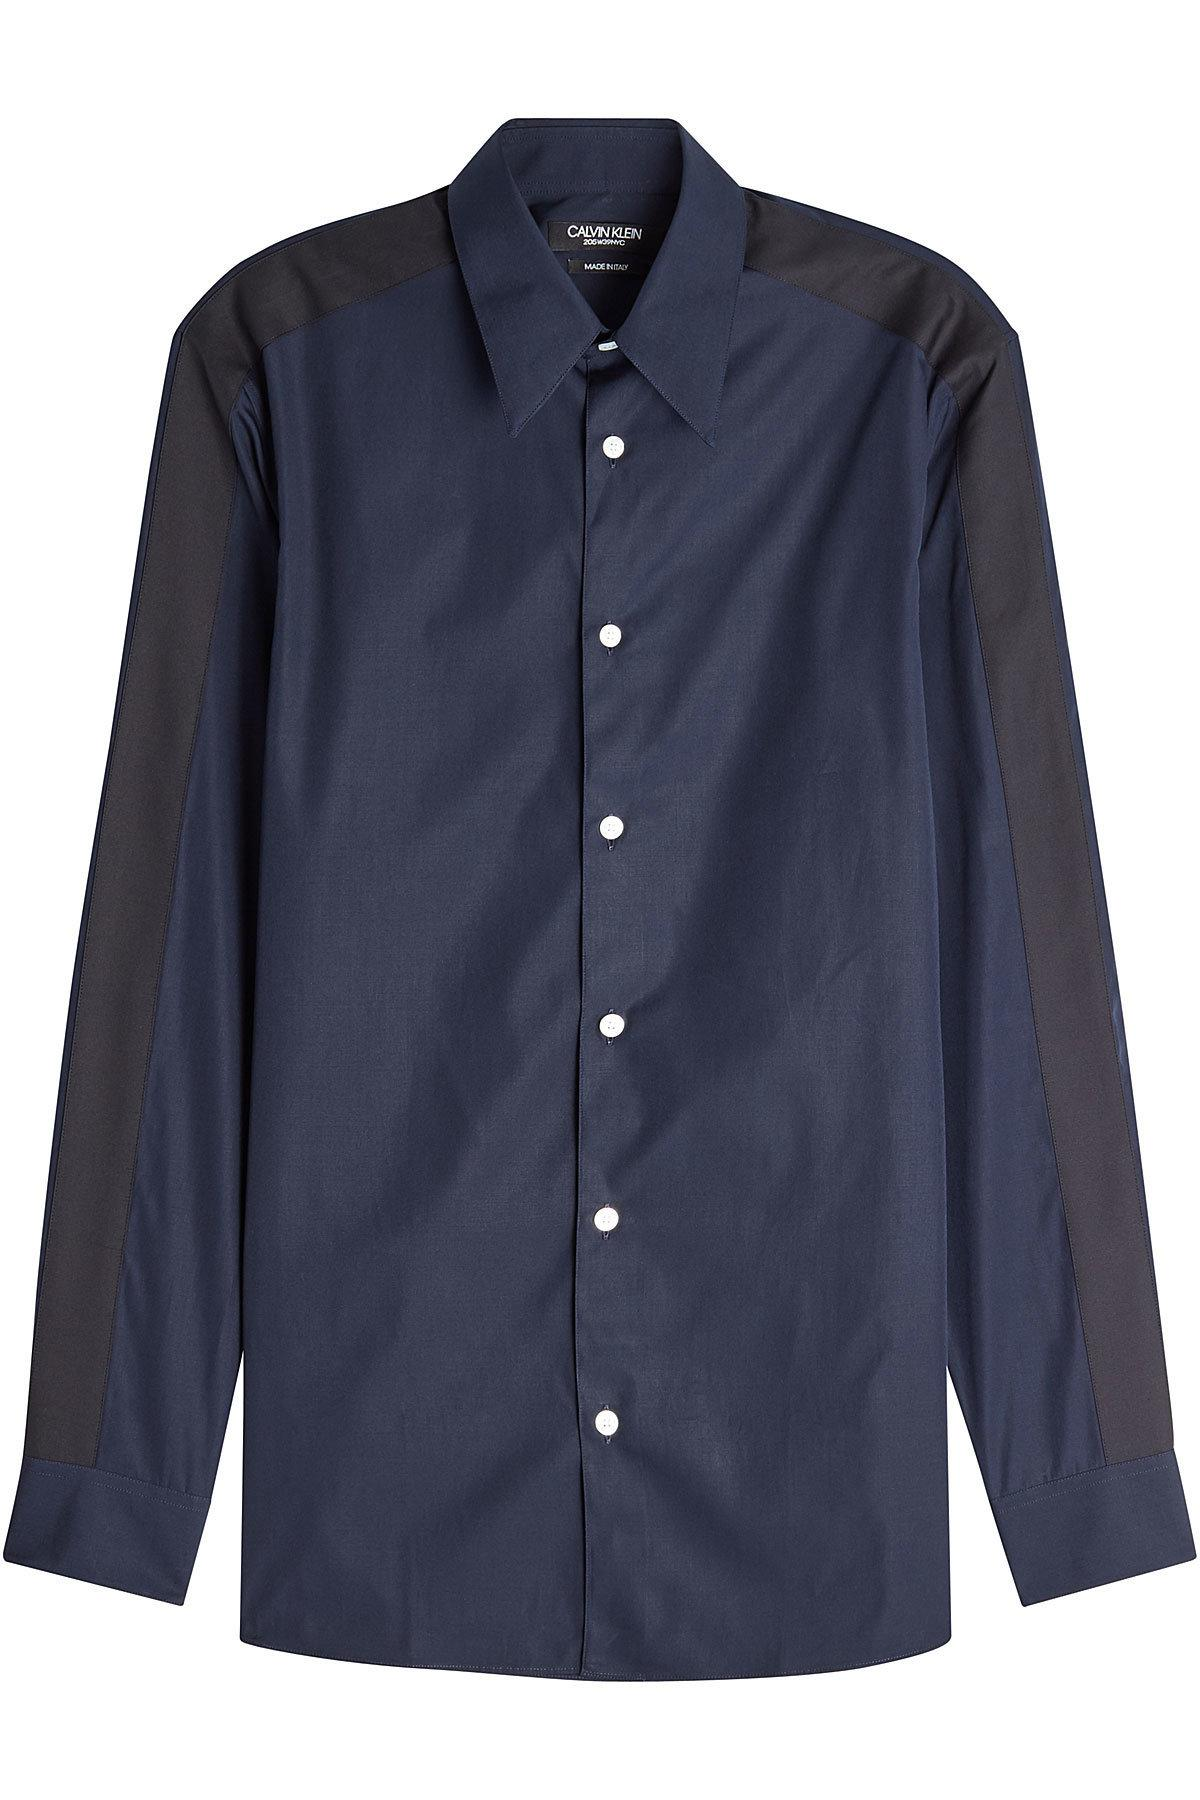 Calvin Klein 205W39Nyc Two-Tone Cotton Shirt In Blue